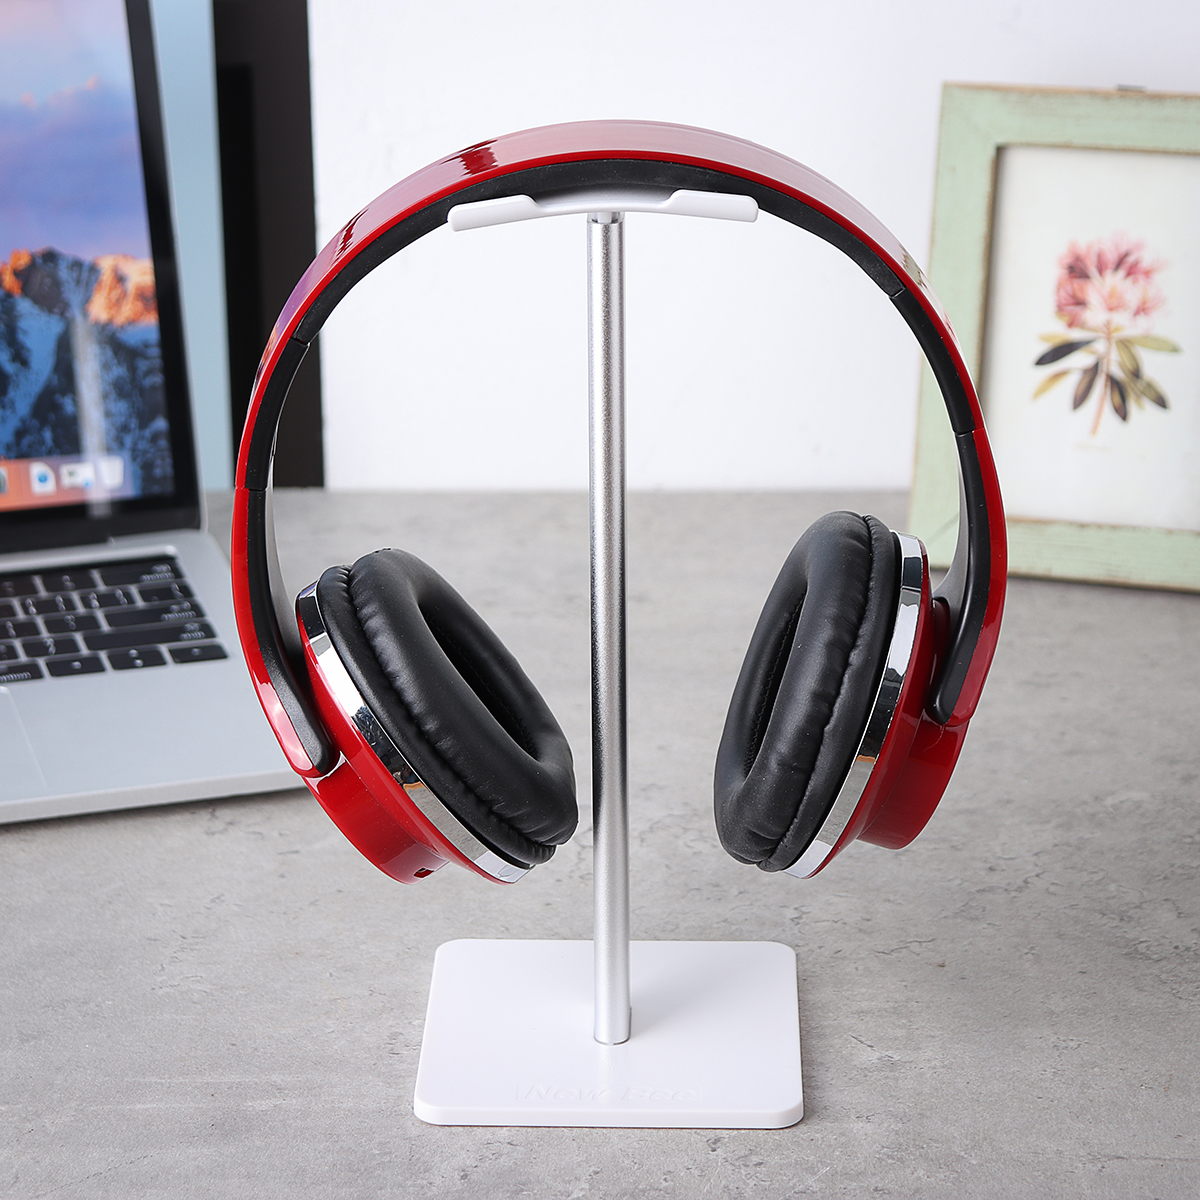 Universal Aluminum Earphone Headset Holder Hanger Headphone Display Stand Mount Bracket